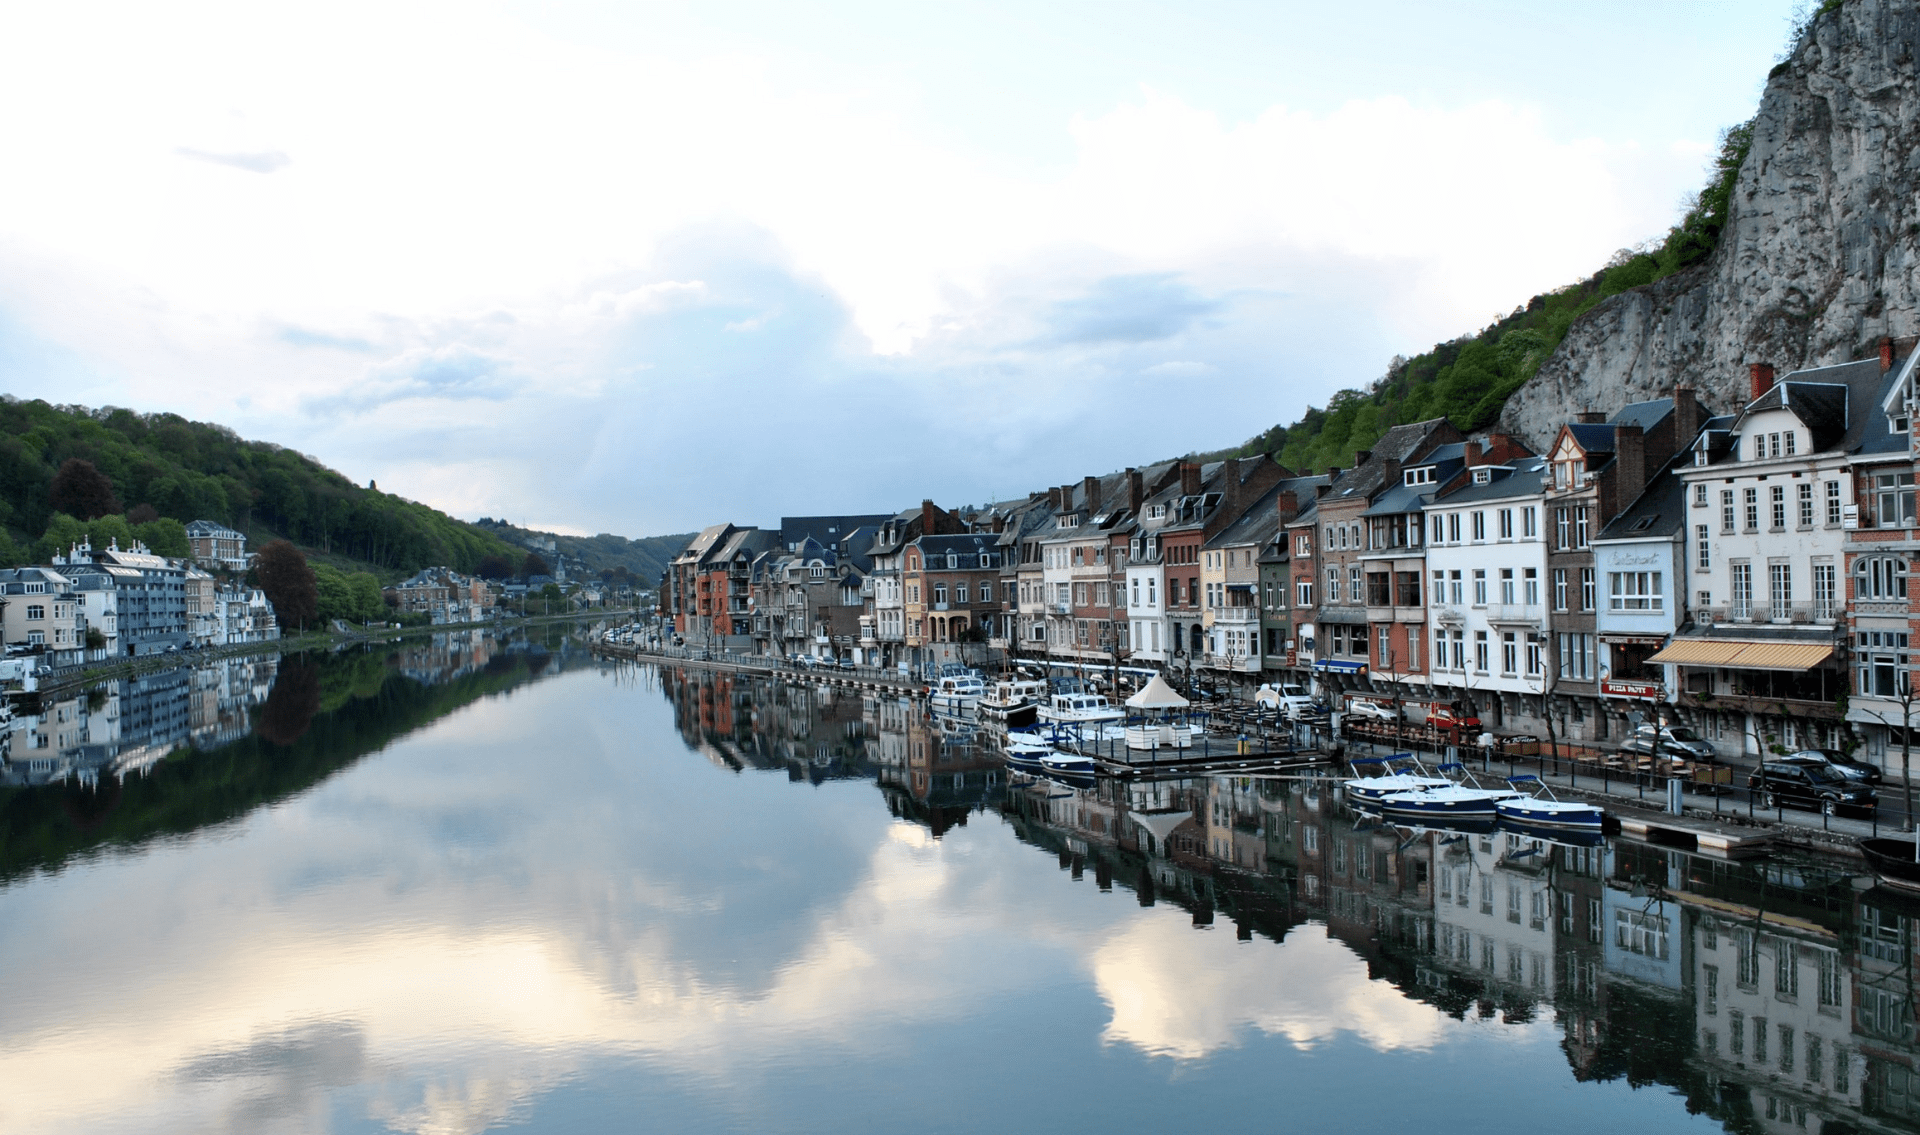 Fietsvakantie Internationale Maasroute van Sedan naar Maastricht